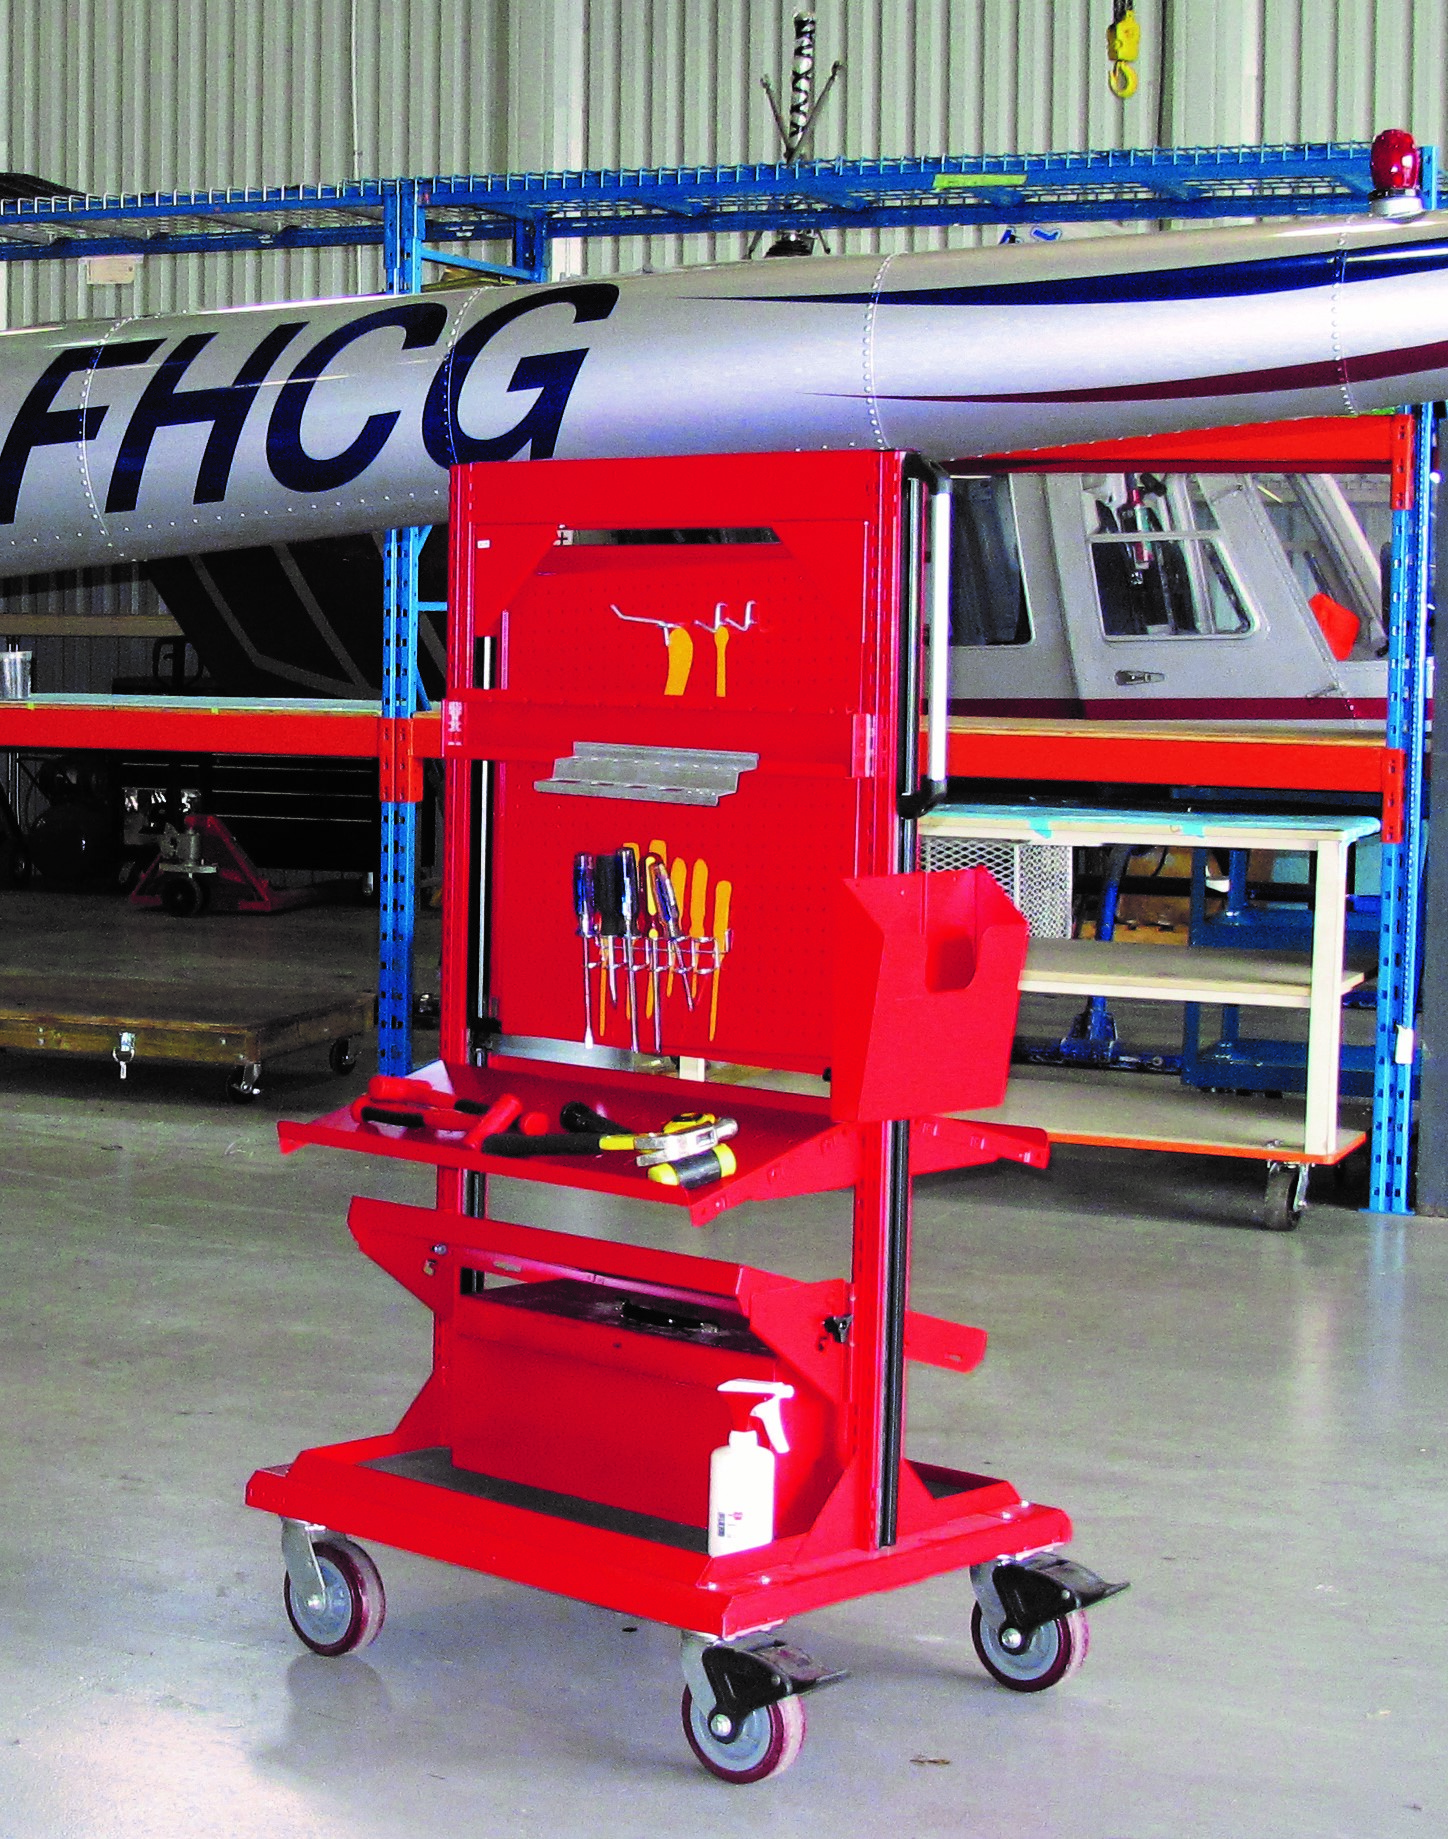 Freestanding Tool Cart in Hangar